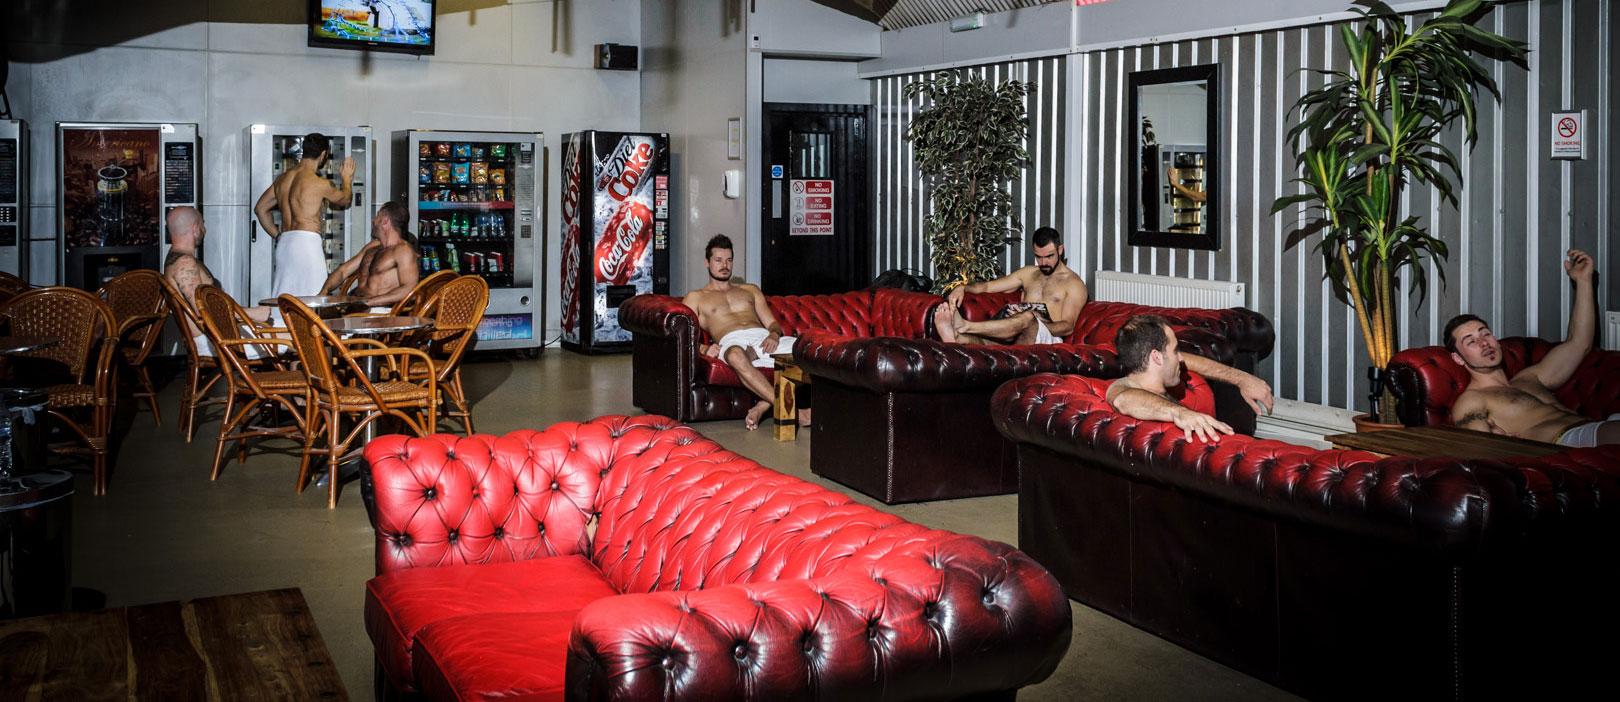 Lounge da sauna gay Chariots Roman Spa, no bairro de Vauxhall, Londres - Foto: chariots.co.uk